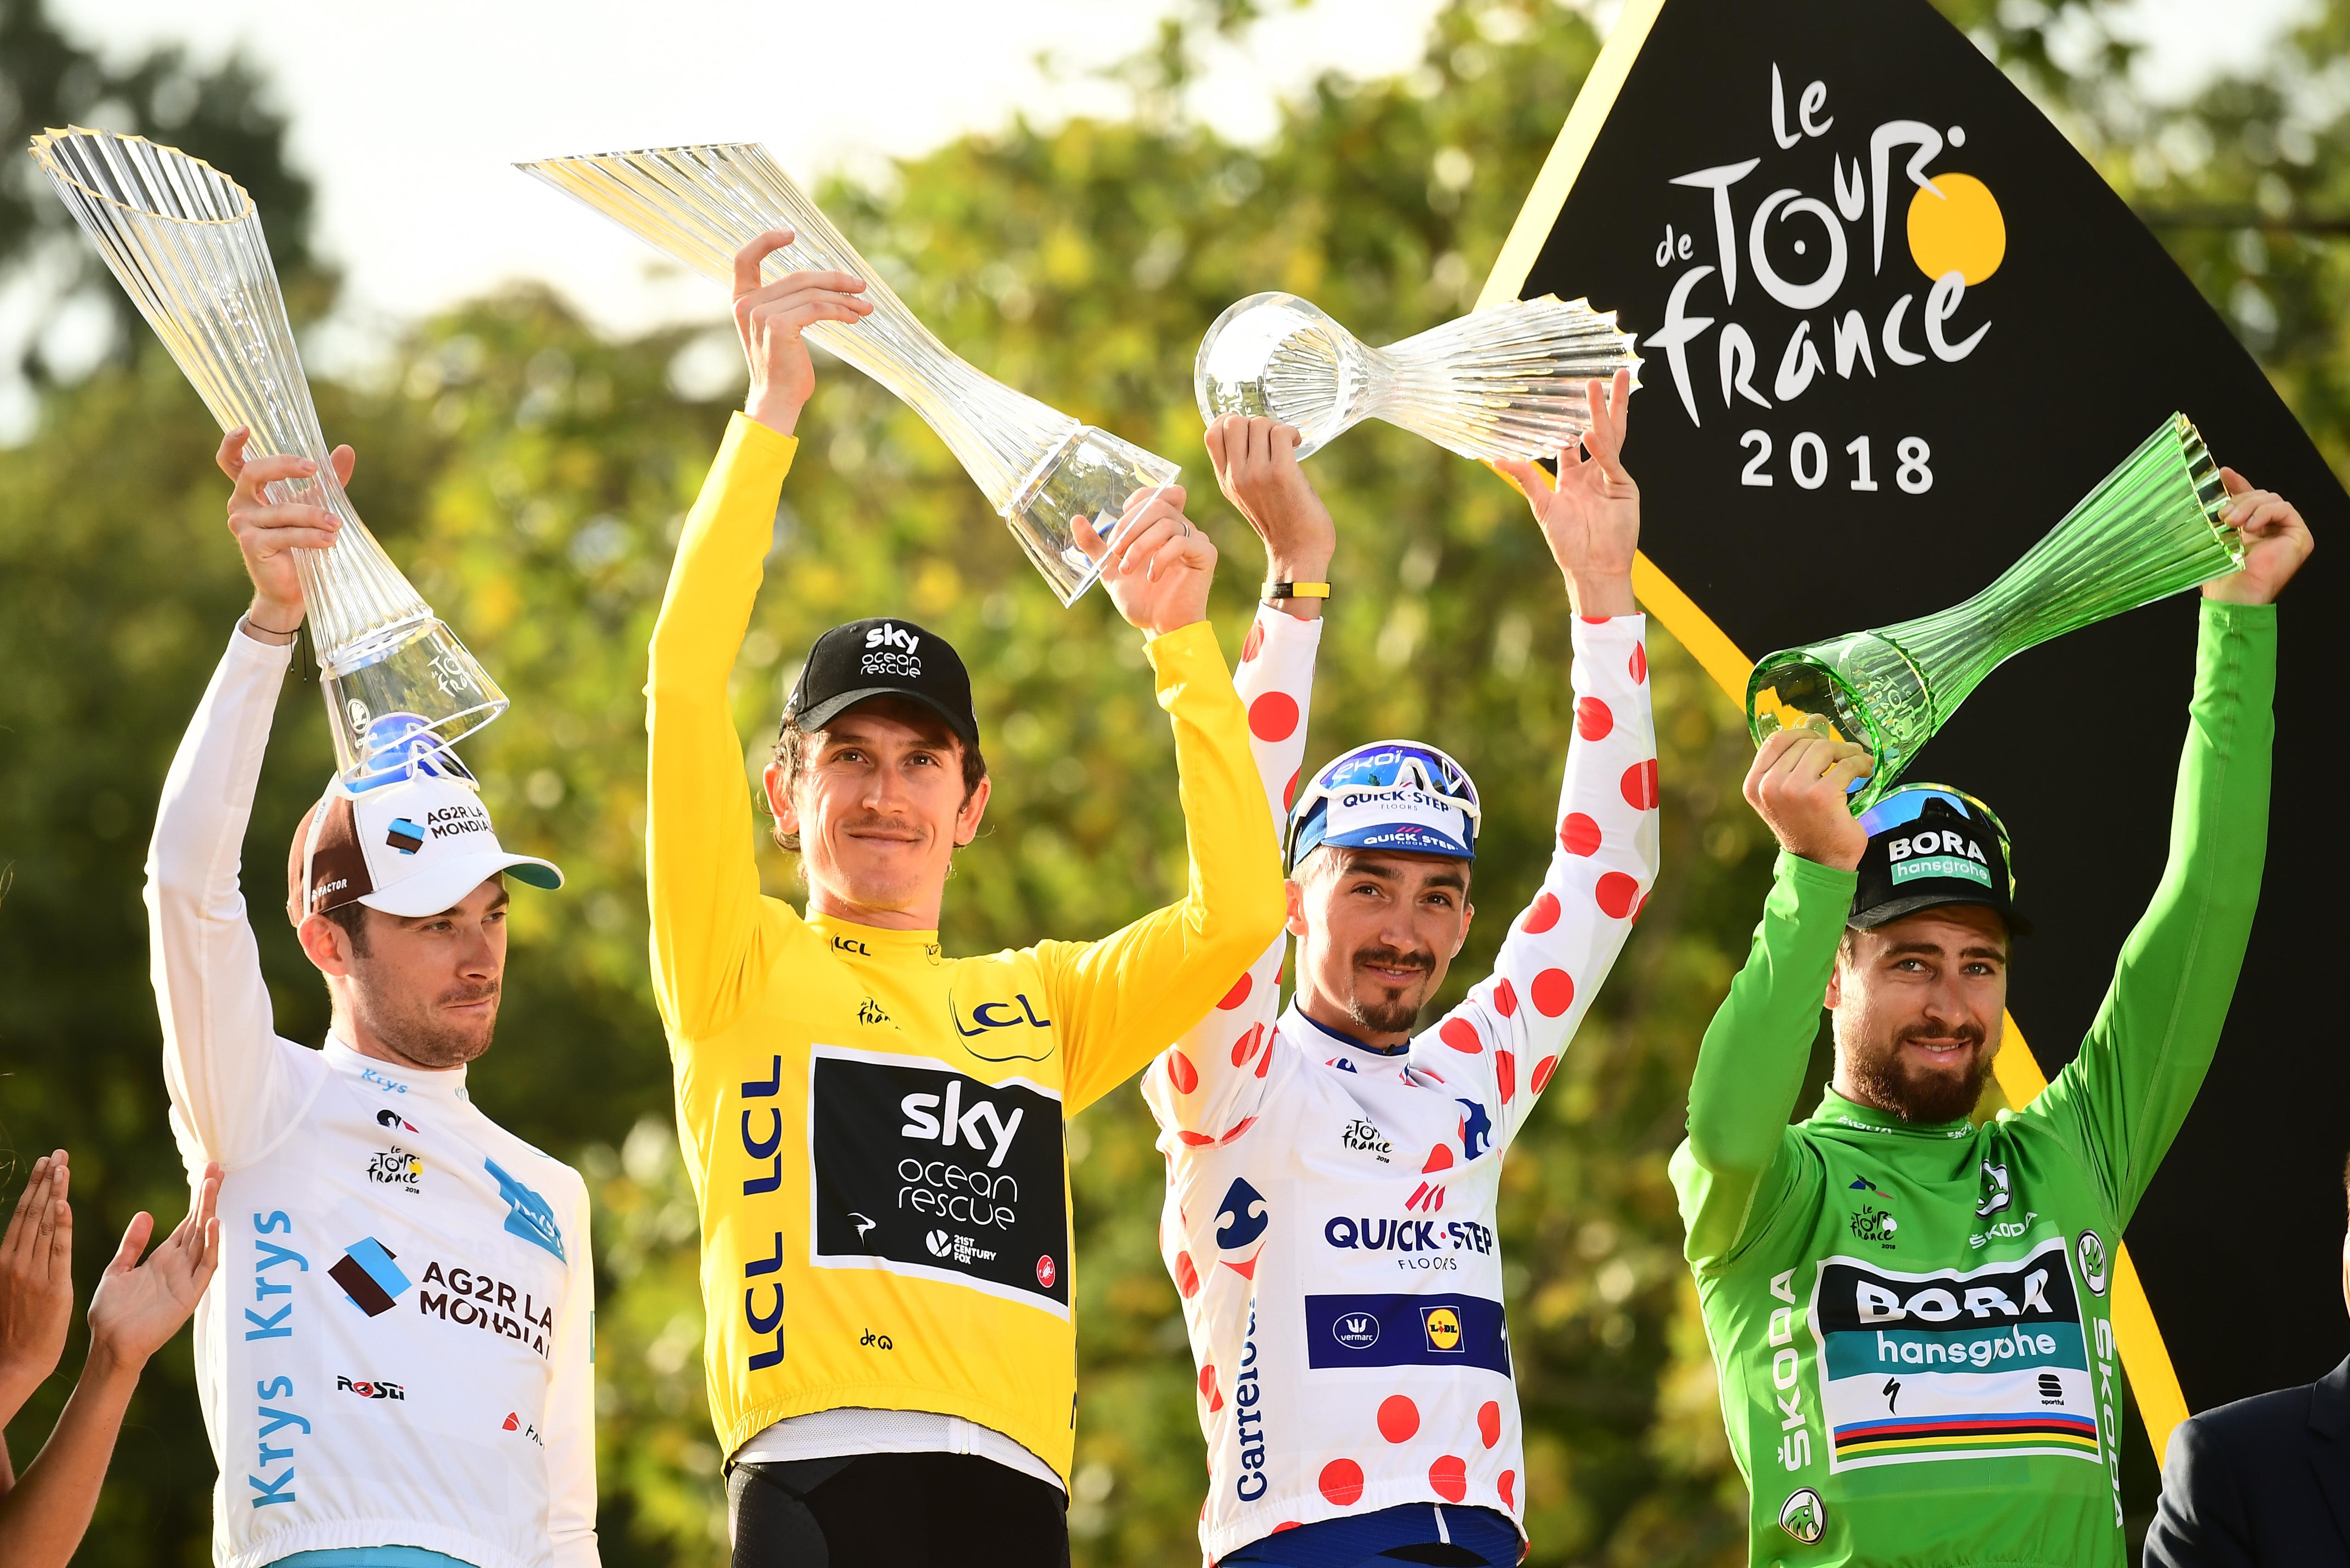 Tour de France winner Geraint Thomas celebrates with ŠKODA AUTO crystal  glass trophy 7c0598fb8